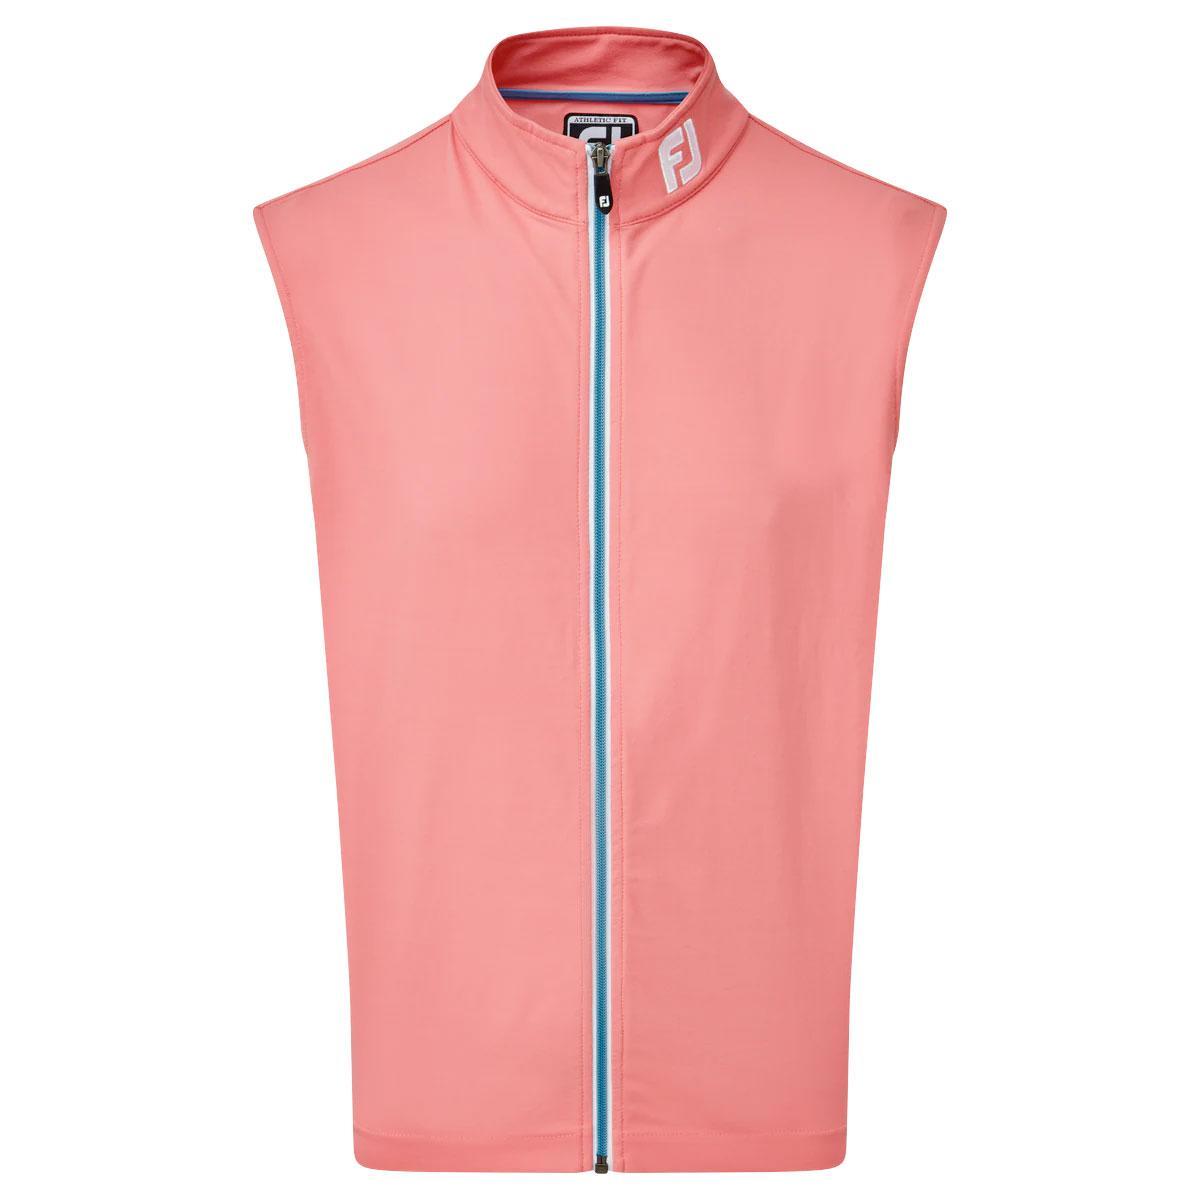 FootJoy Full Zip Knit Vest Mens Golf Gilet  - Cape Red